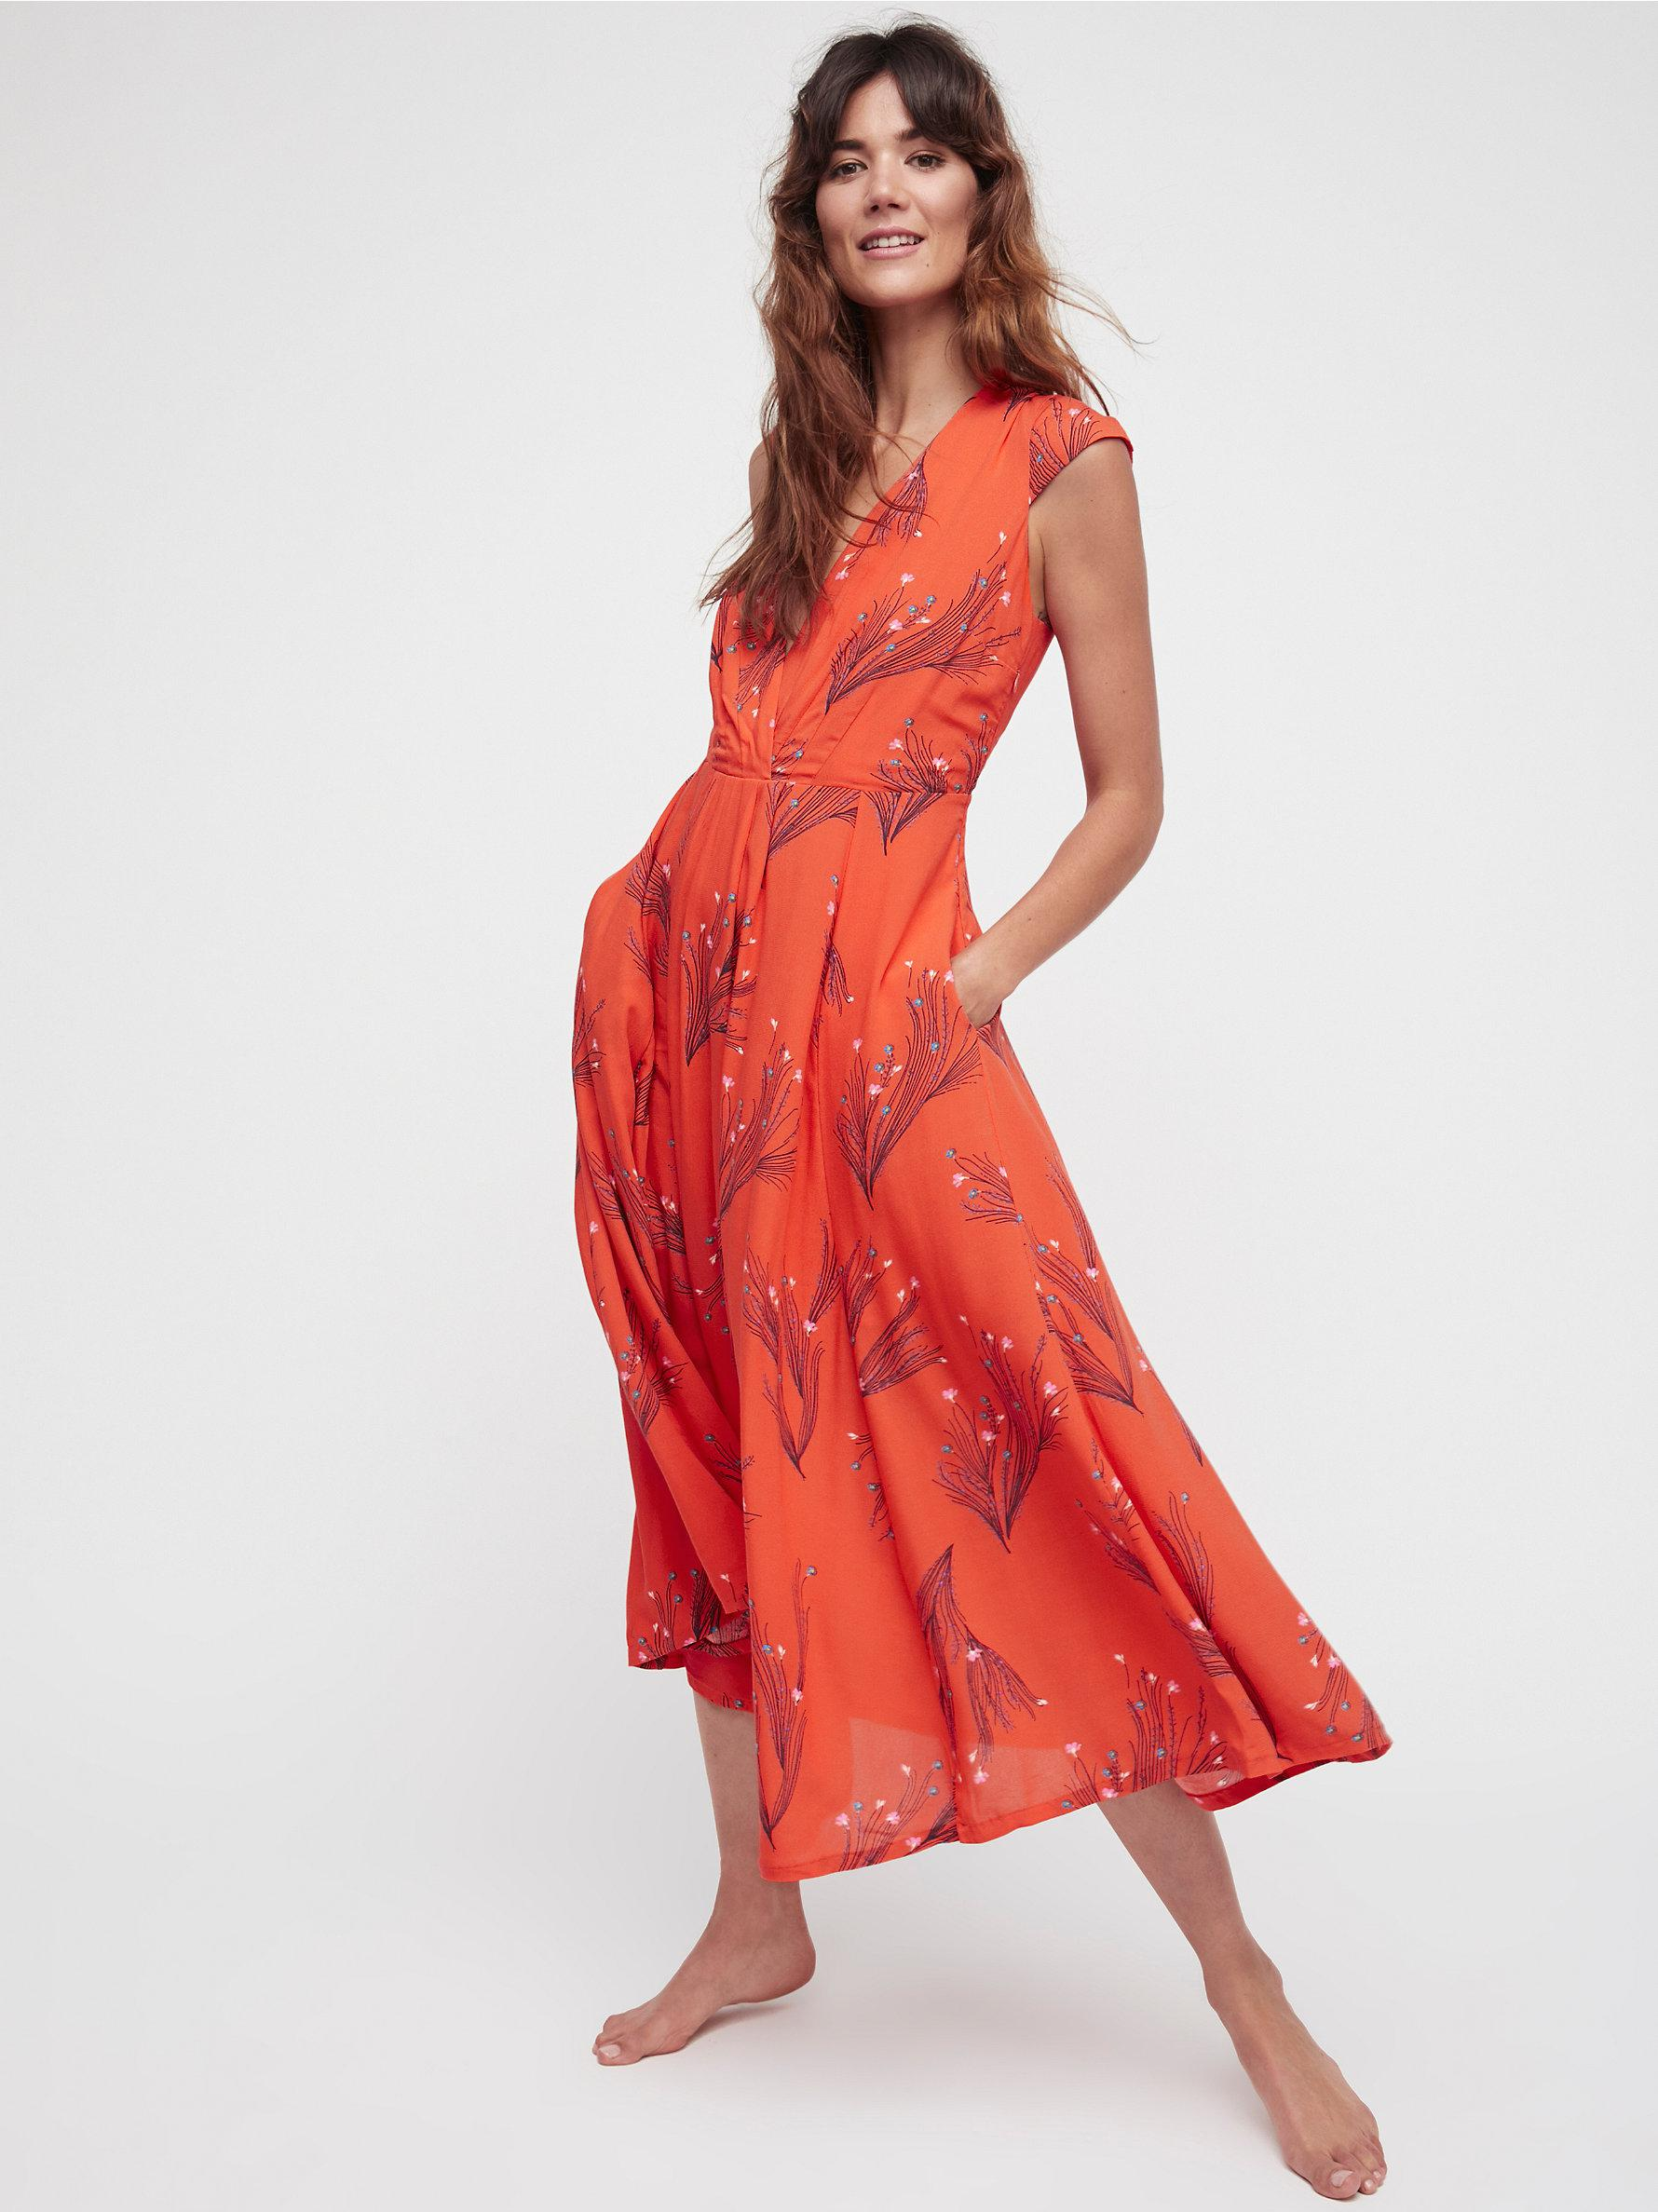 Lyst - Free People Printed Retro Midi Dress in Orange